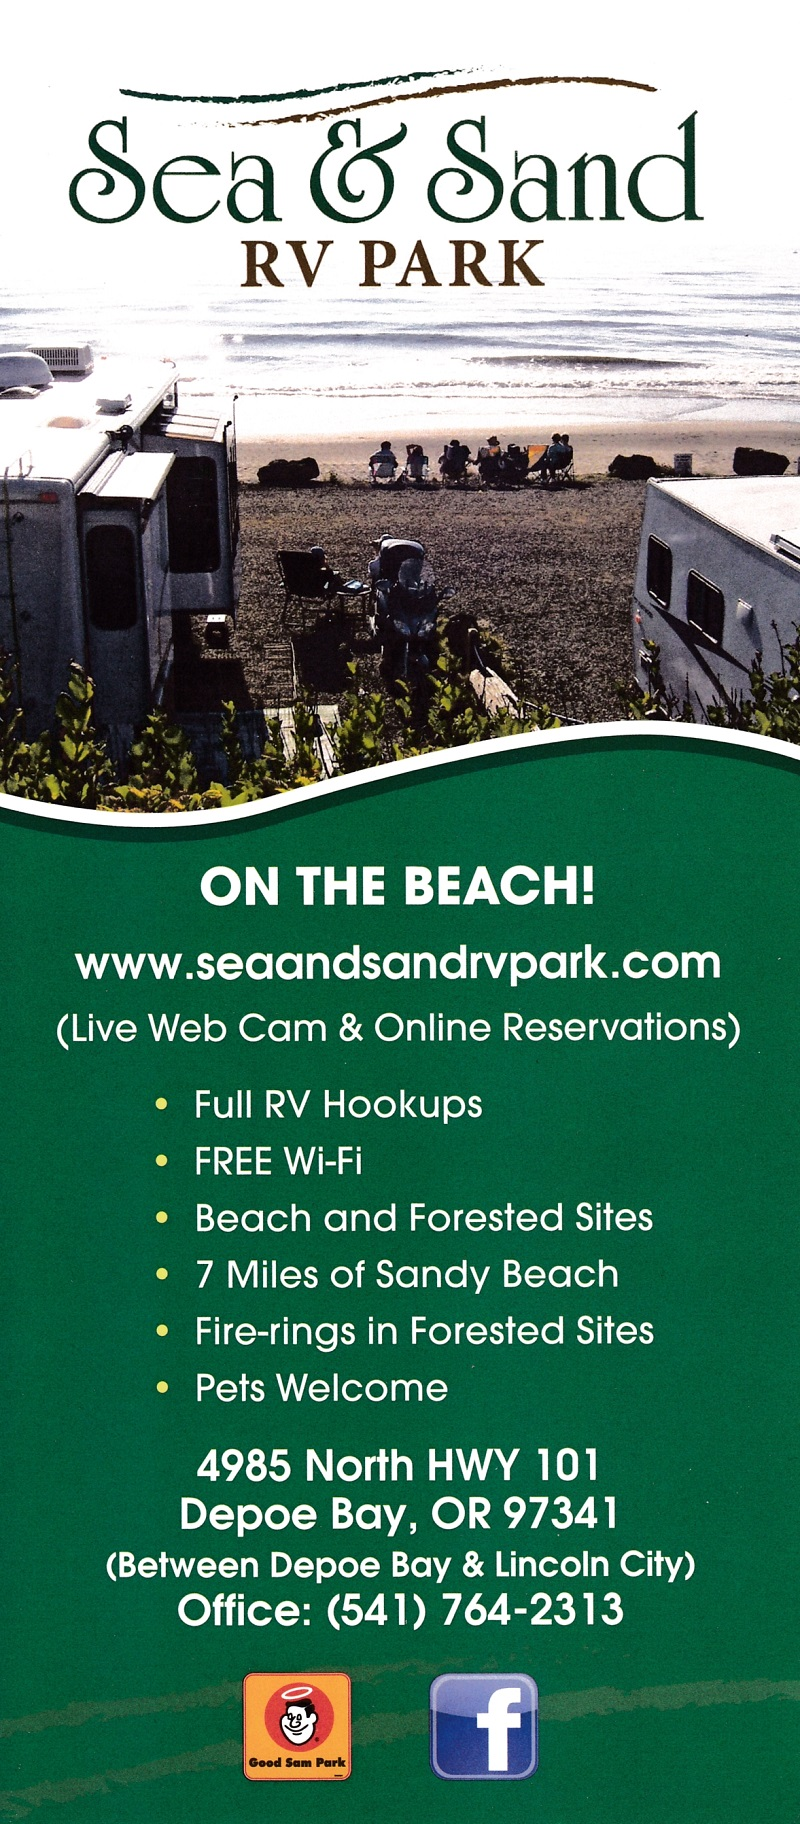 Sea & Sand RV Park